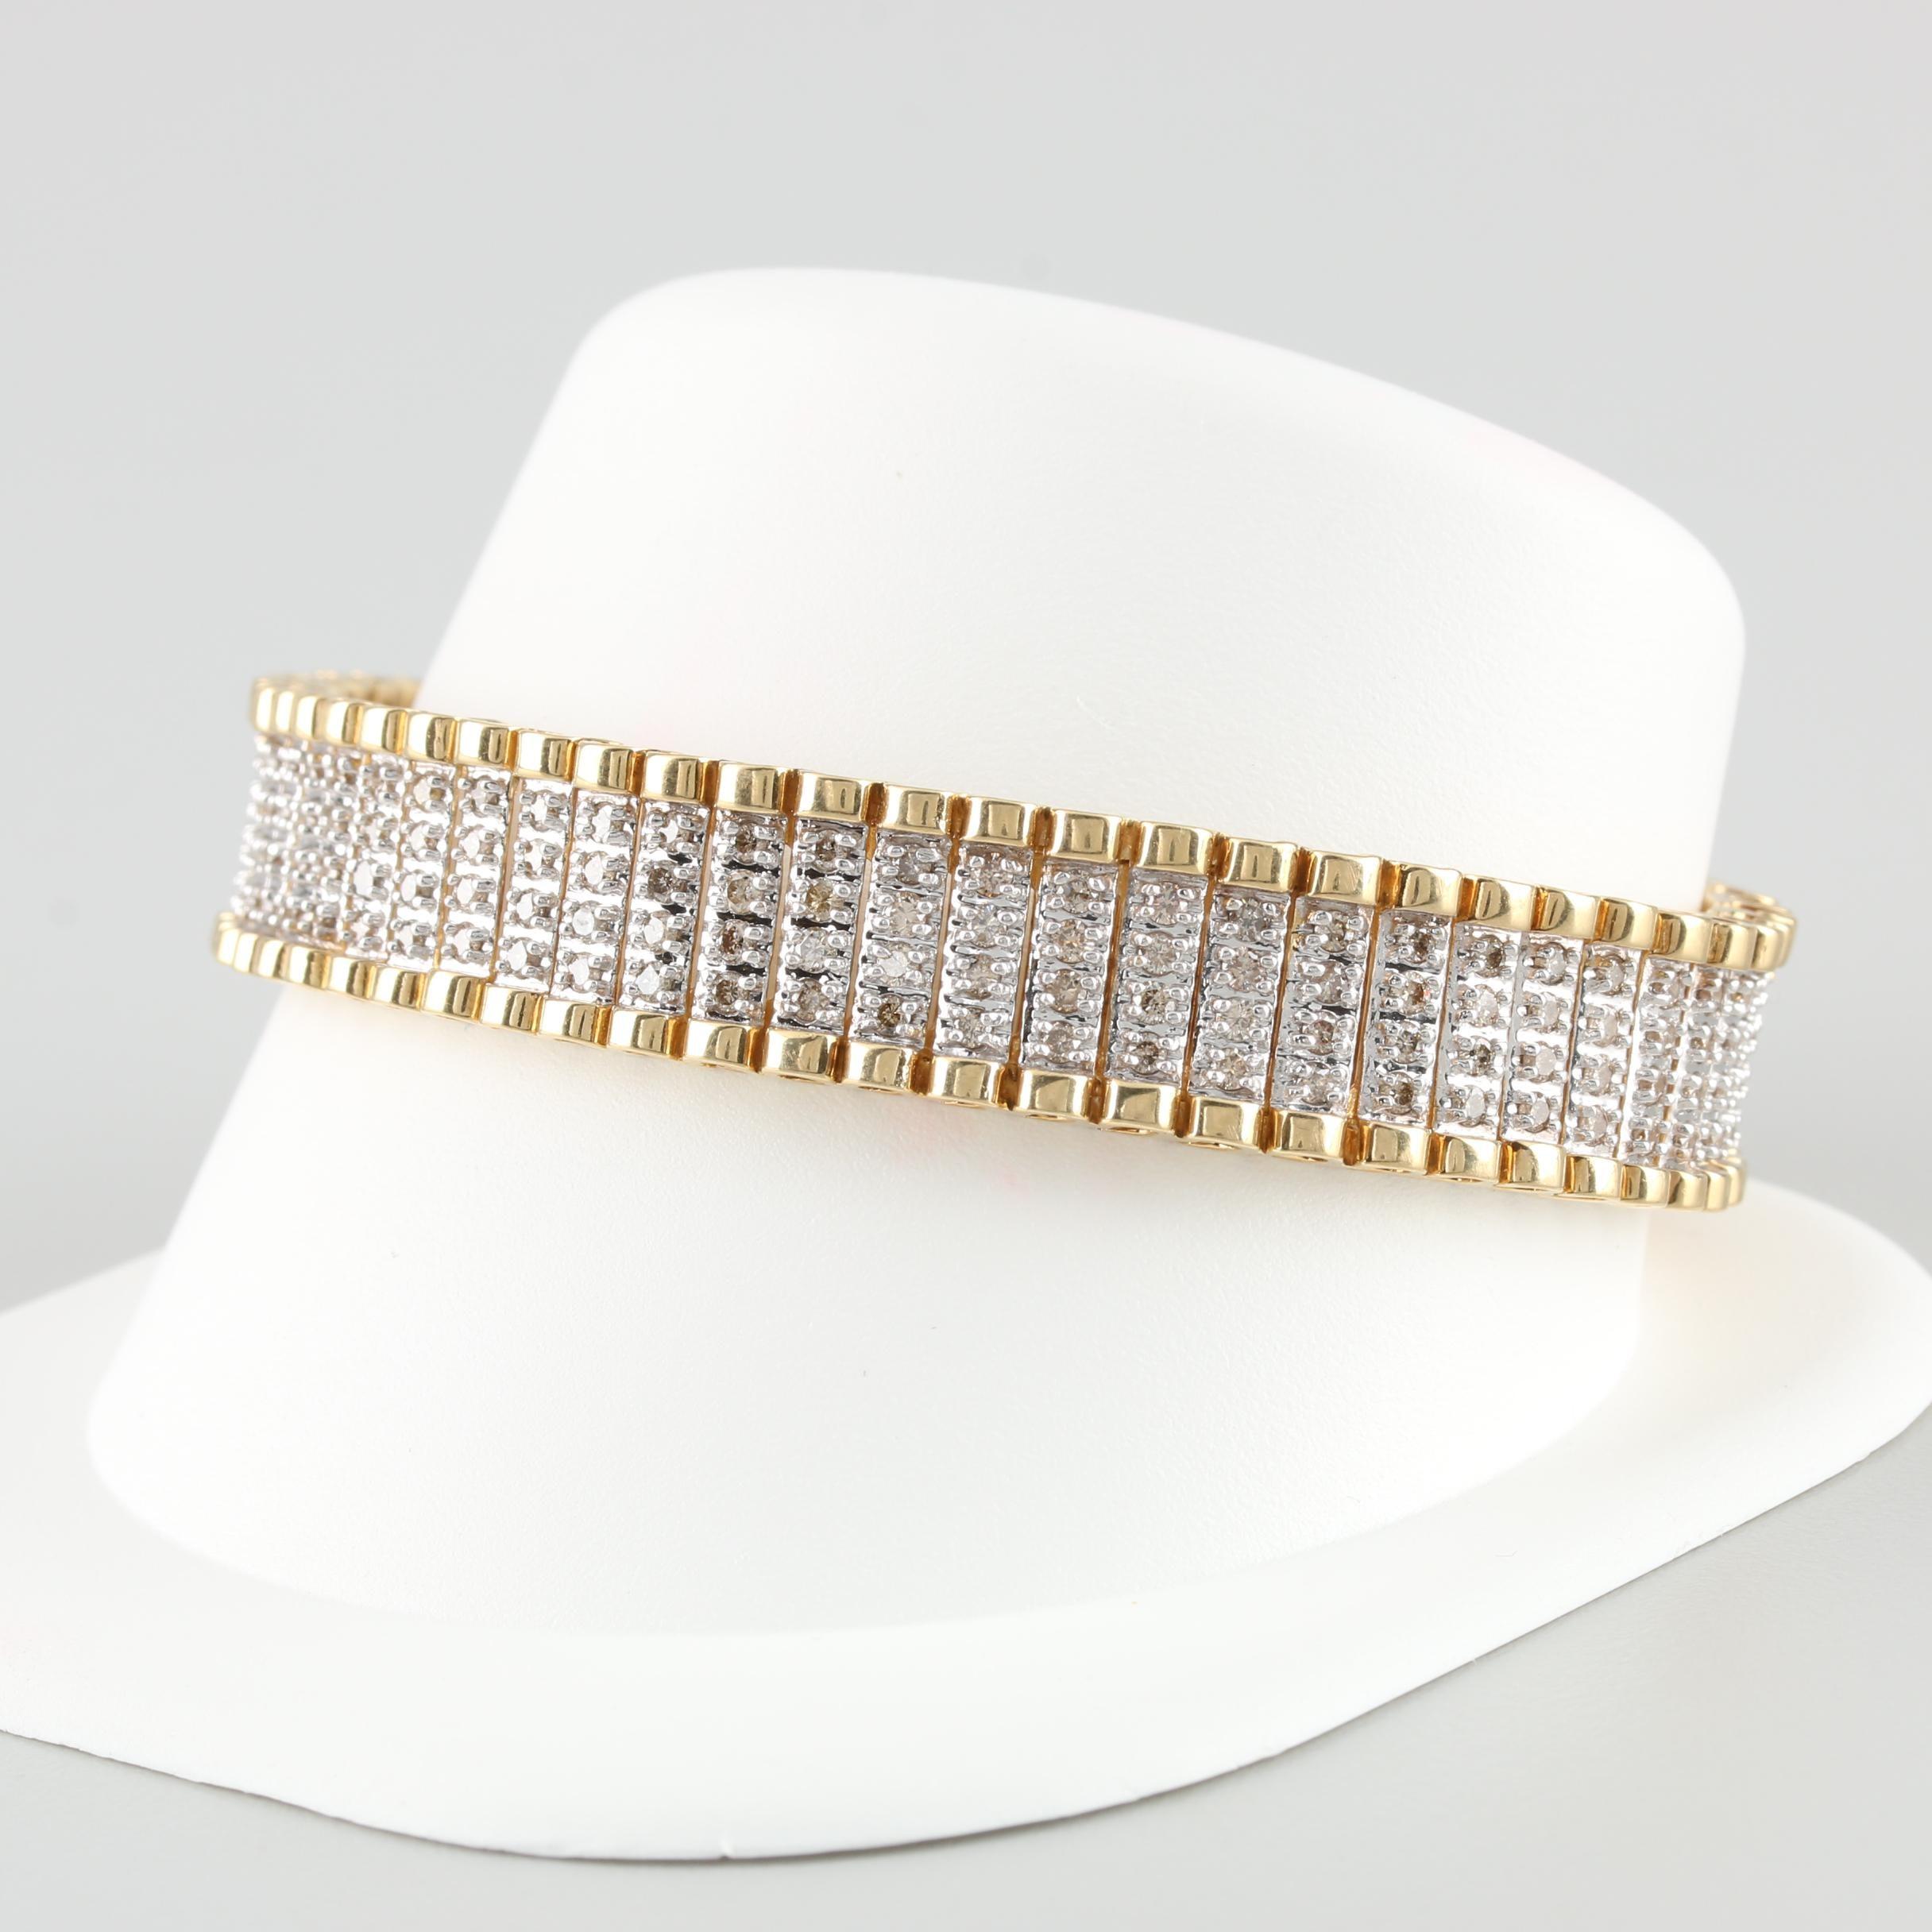 10K Yellow and White Gold 4.64 CTW Diamond Bracelet